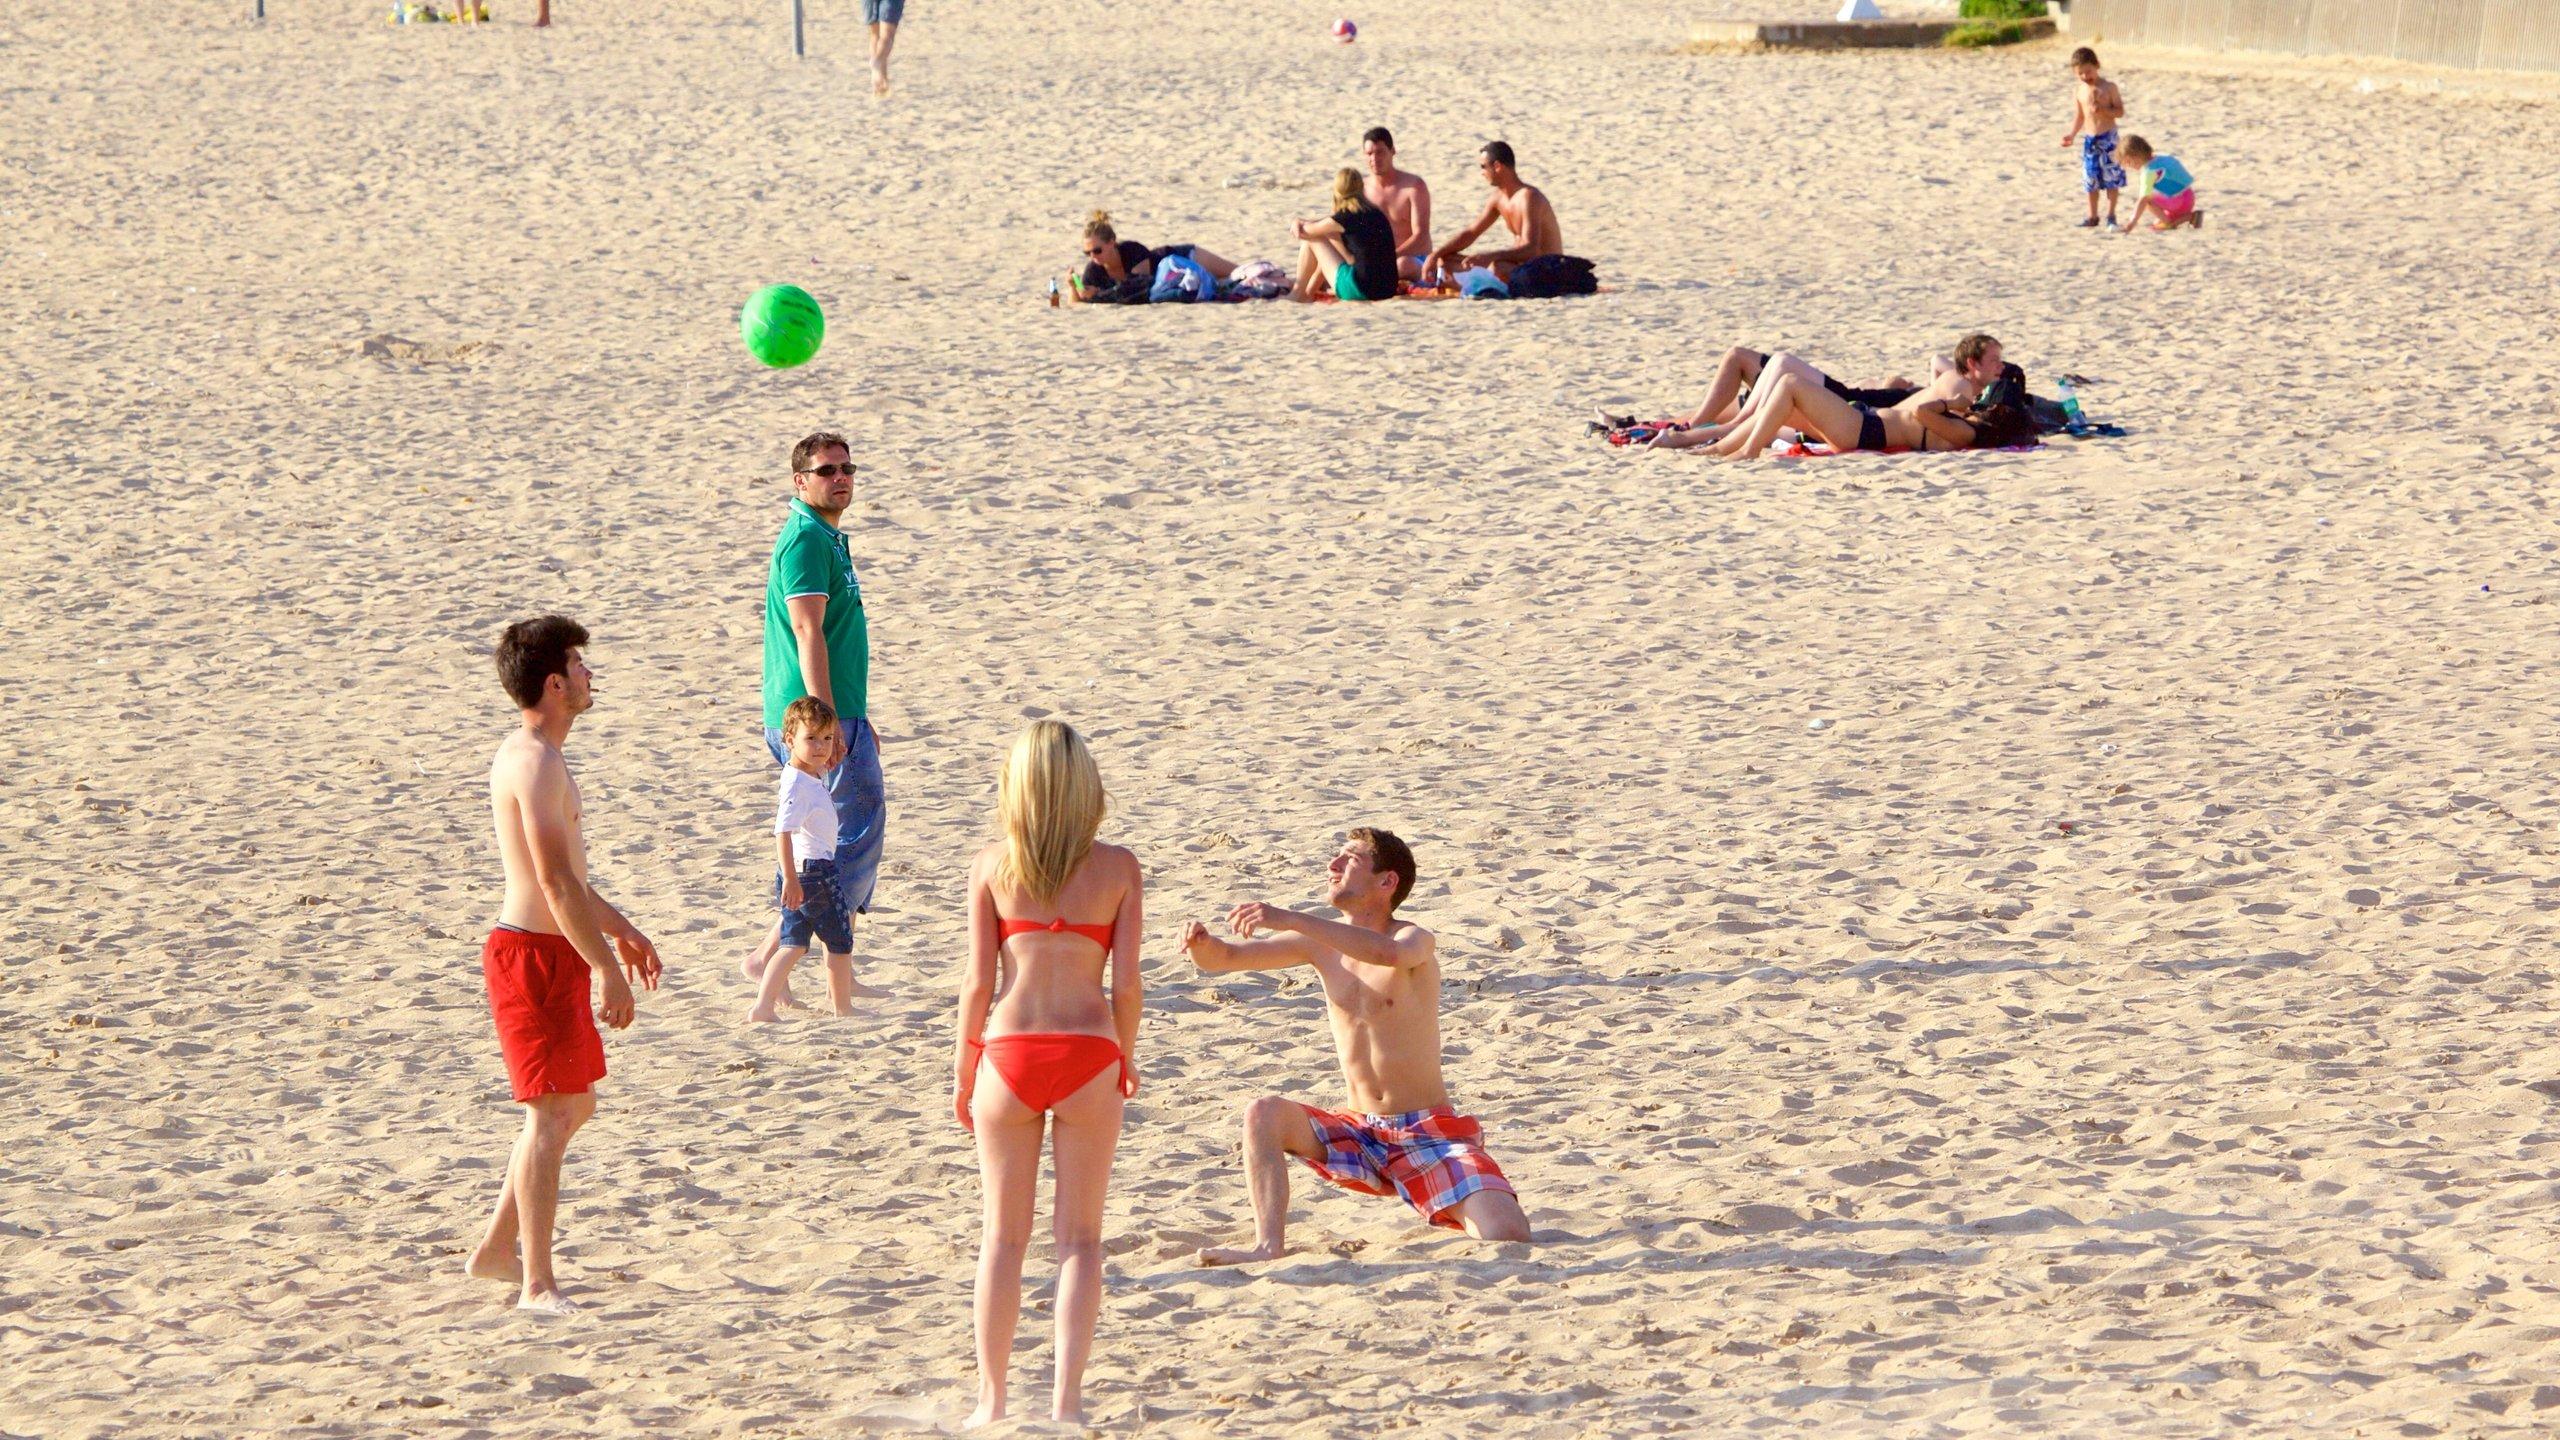 Minimes Beach, La Rochelle, Charente-Maritime, France